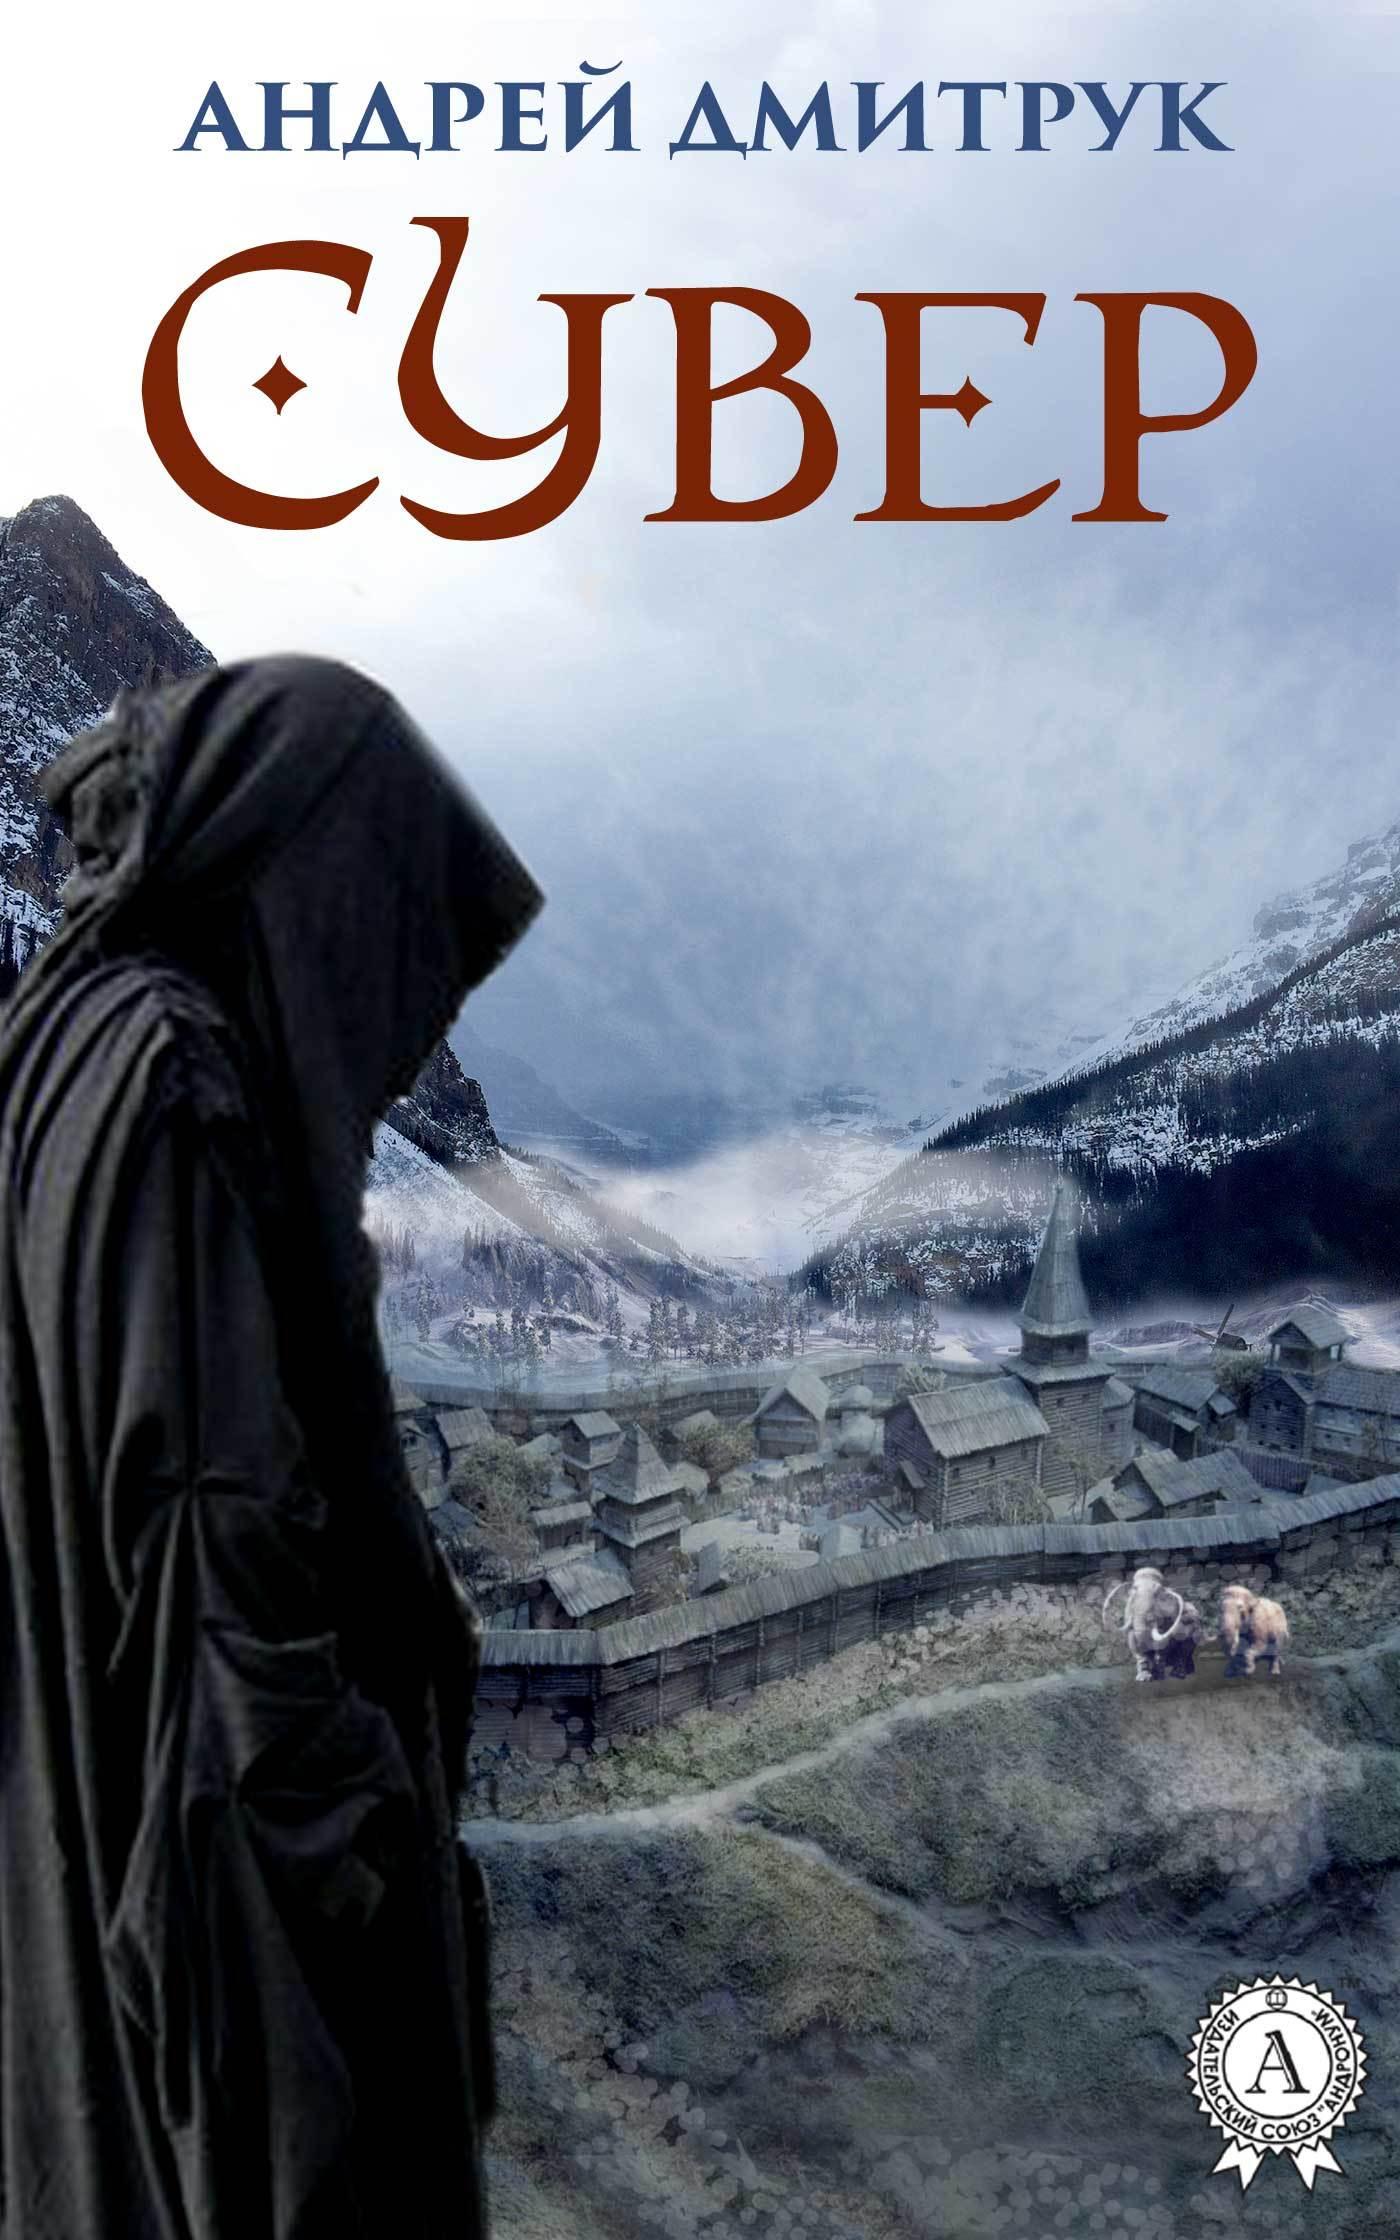 Андрей Дмитрук Сувер андрей дмитрук битва богов